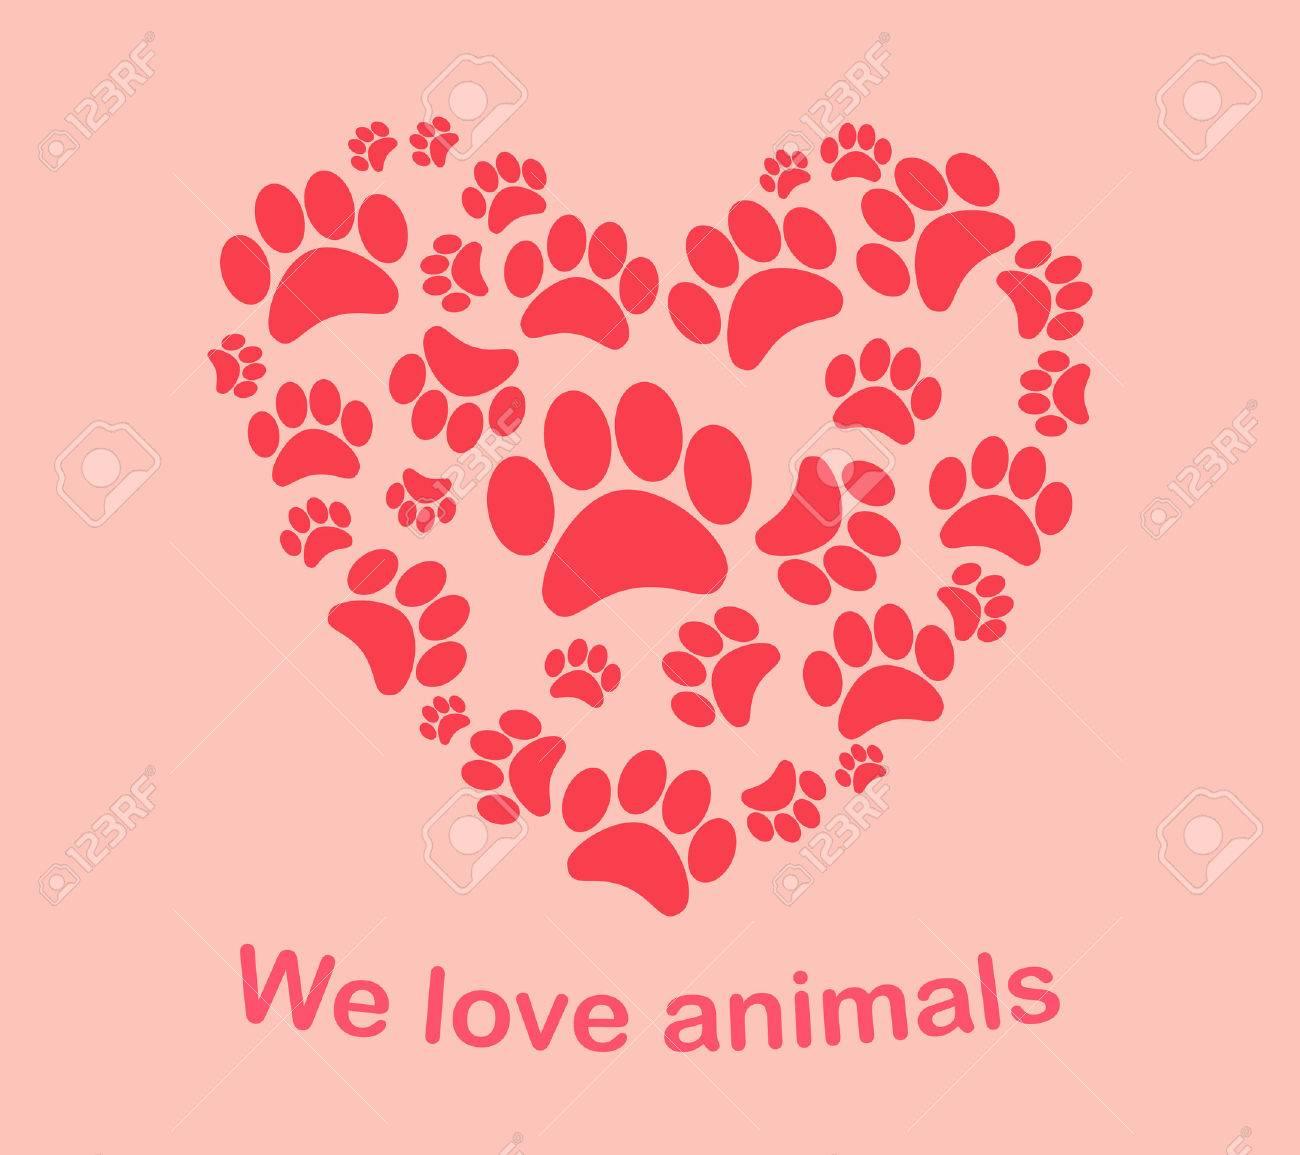 Heart animal s footprints - 31024291